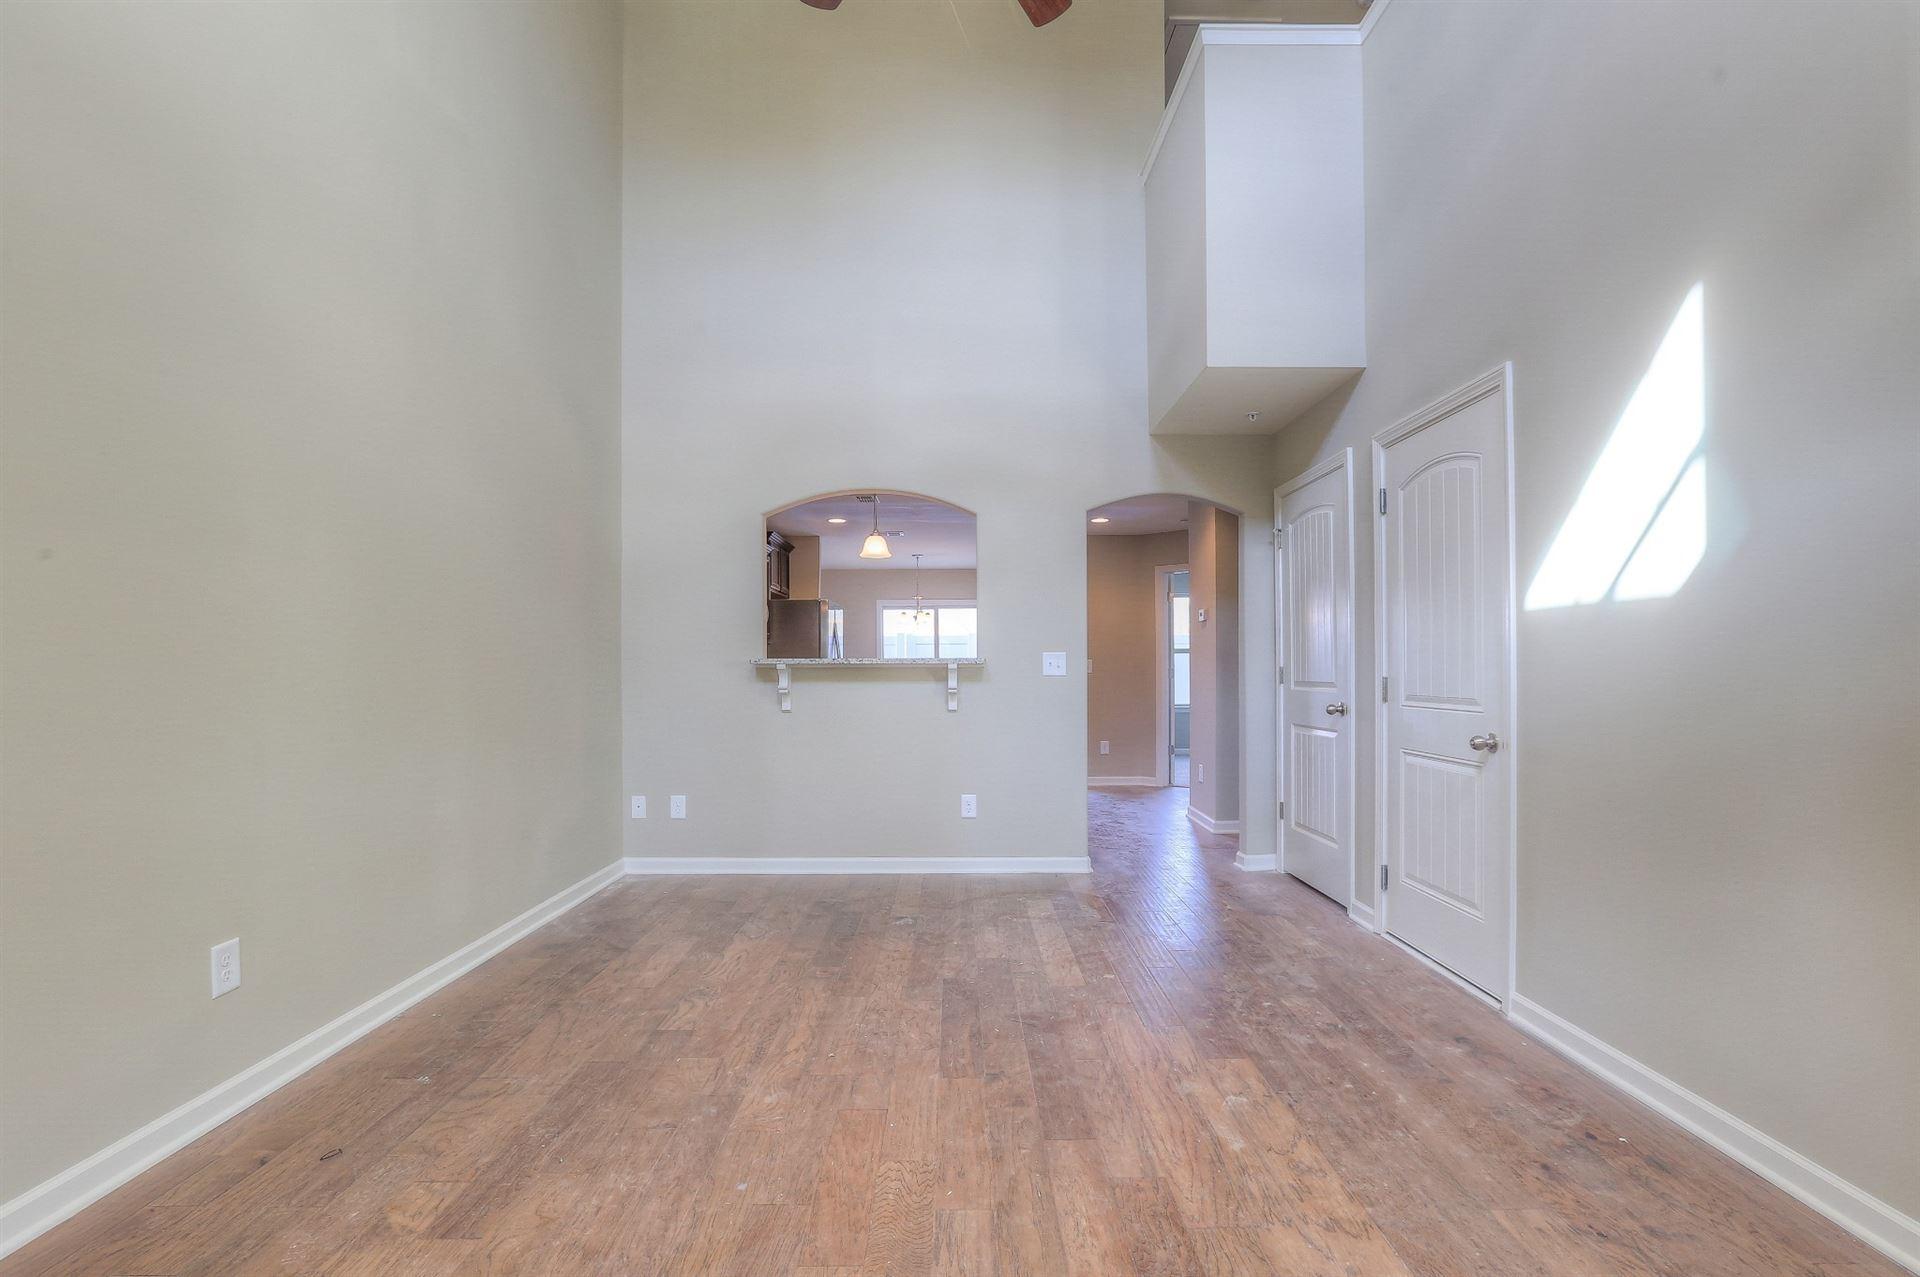 Photo of 315 Mattie Lane Lot 39, Spring Hill, TN 37174 (MLS # 2198446)